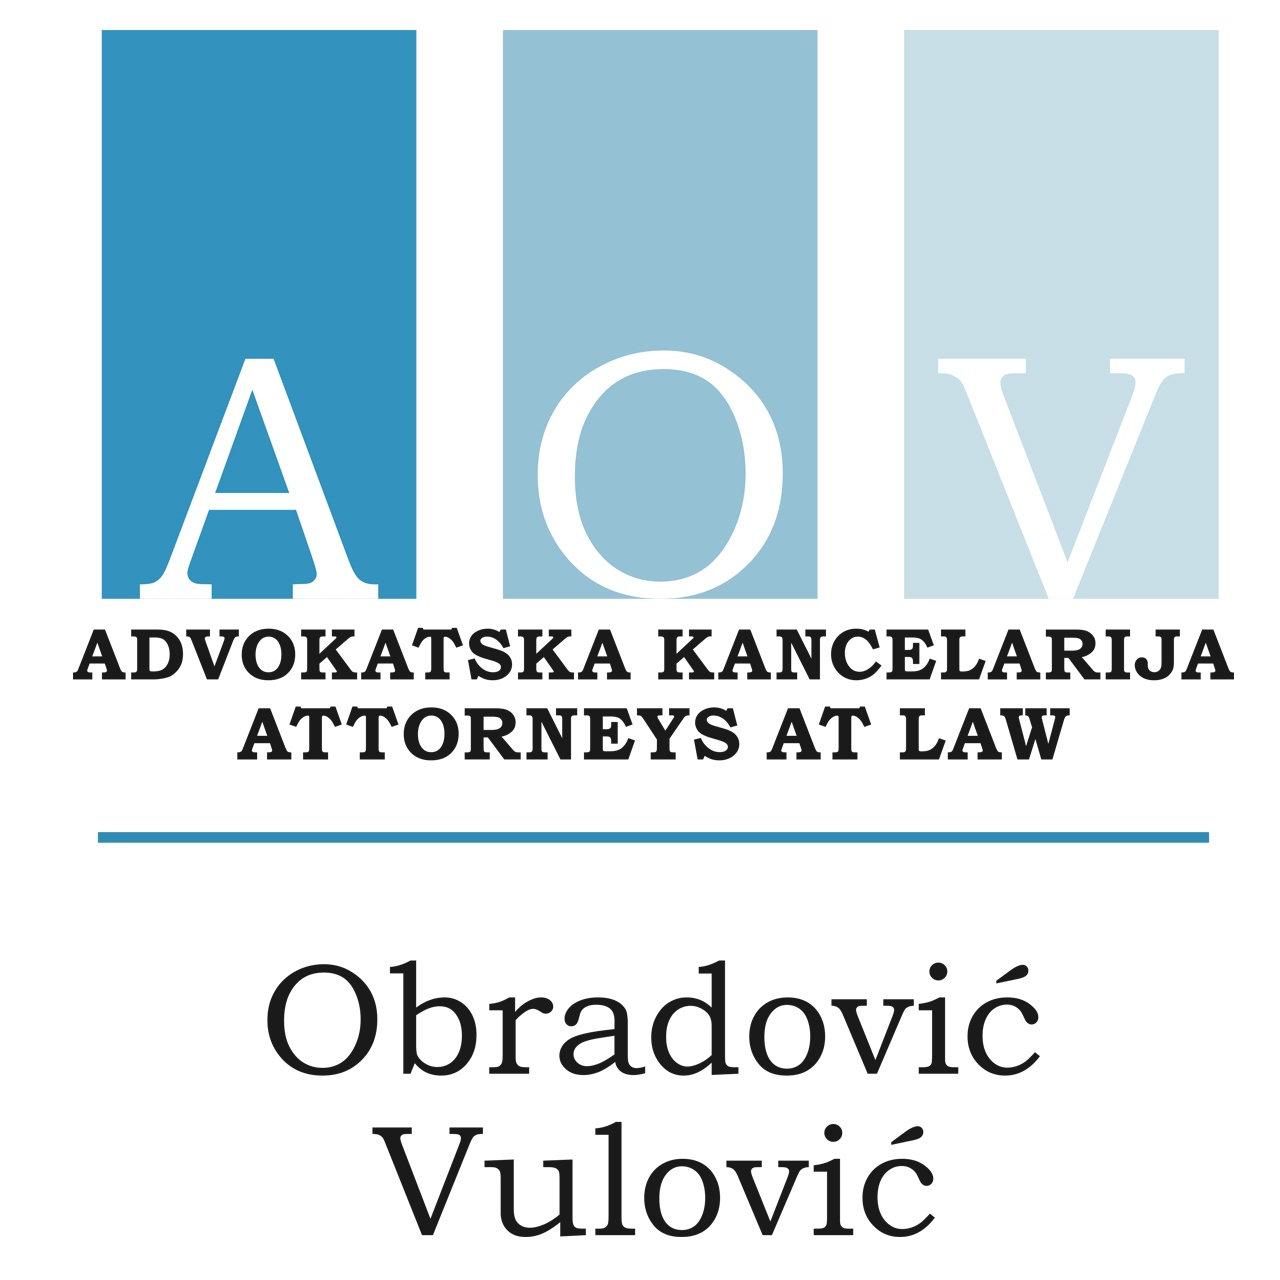 Advokatska Kancelarija Attorneys at Law Obradović Vulović